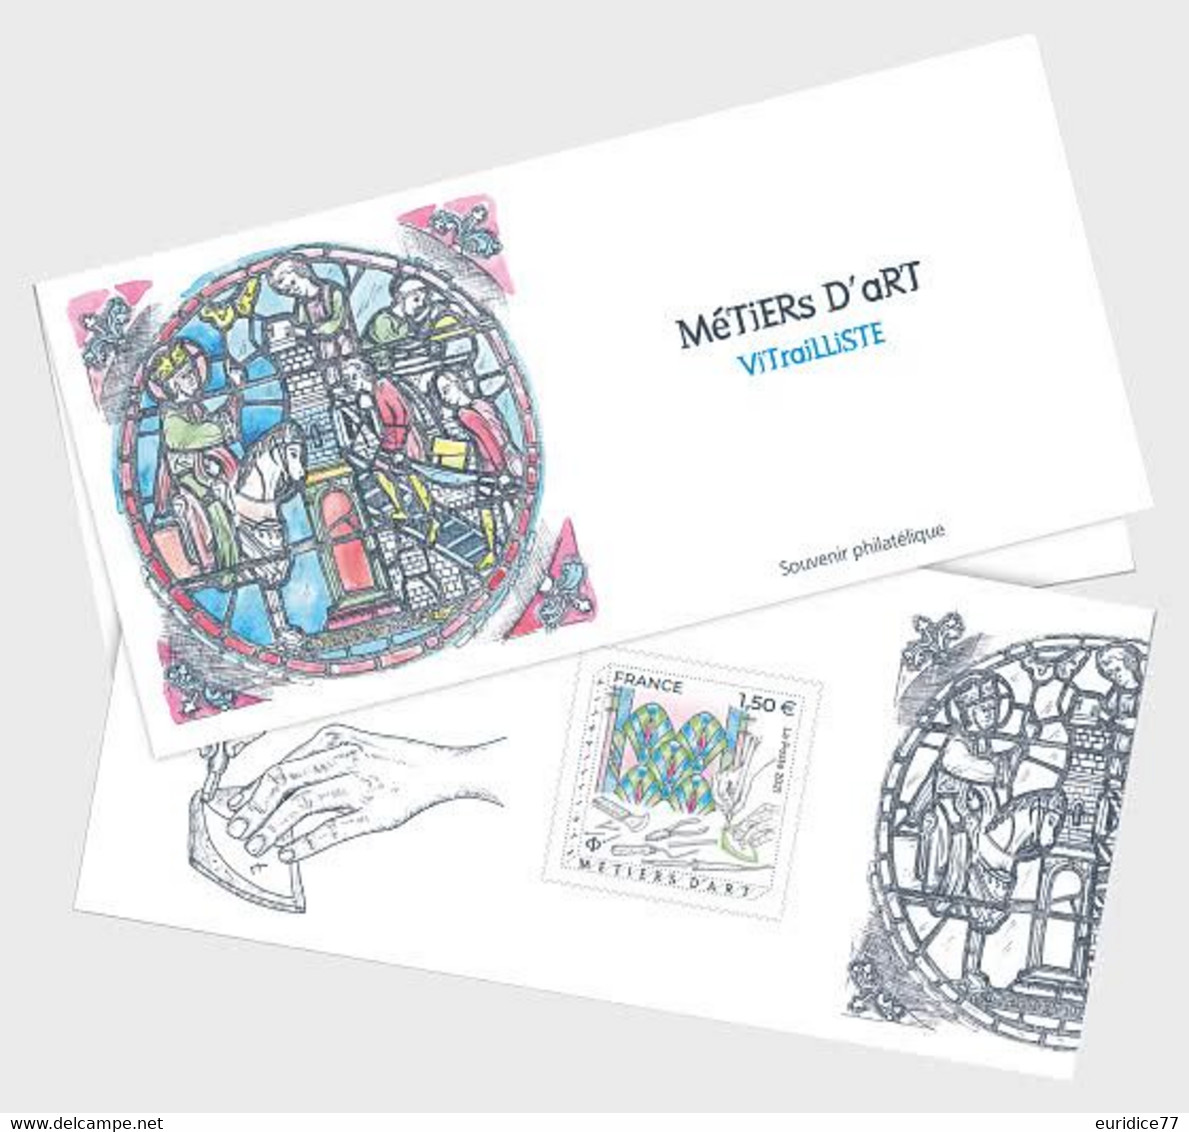 France 2021 - Metiers Art Vitralliste Souvenir - Ungebraucht